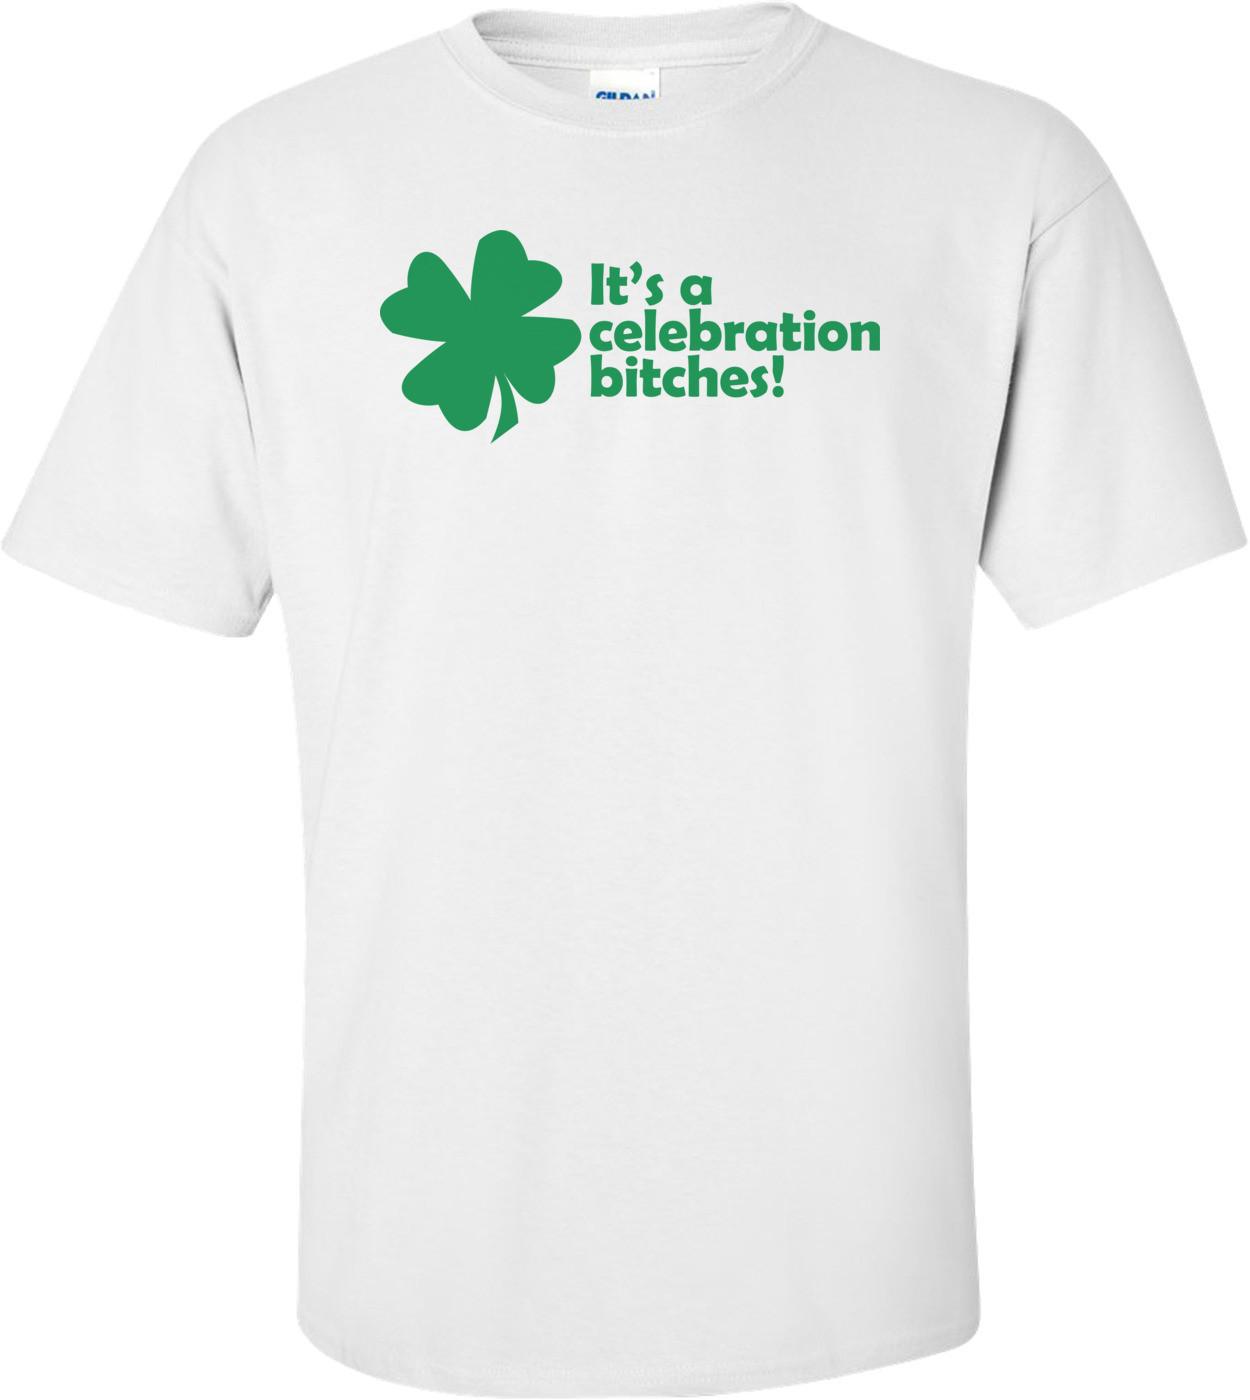 It's A Celebration Bitches St. Paddy's Day Shirt